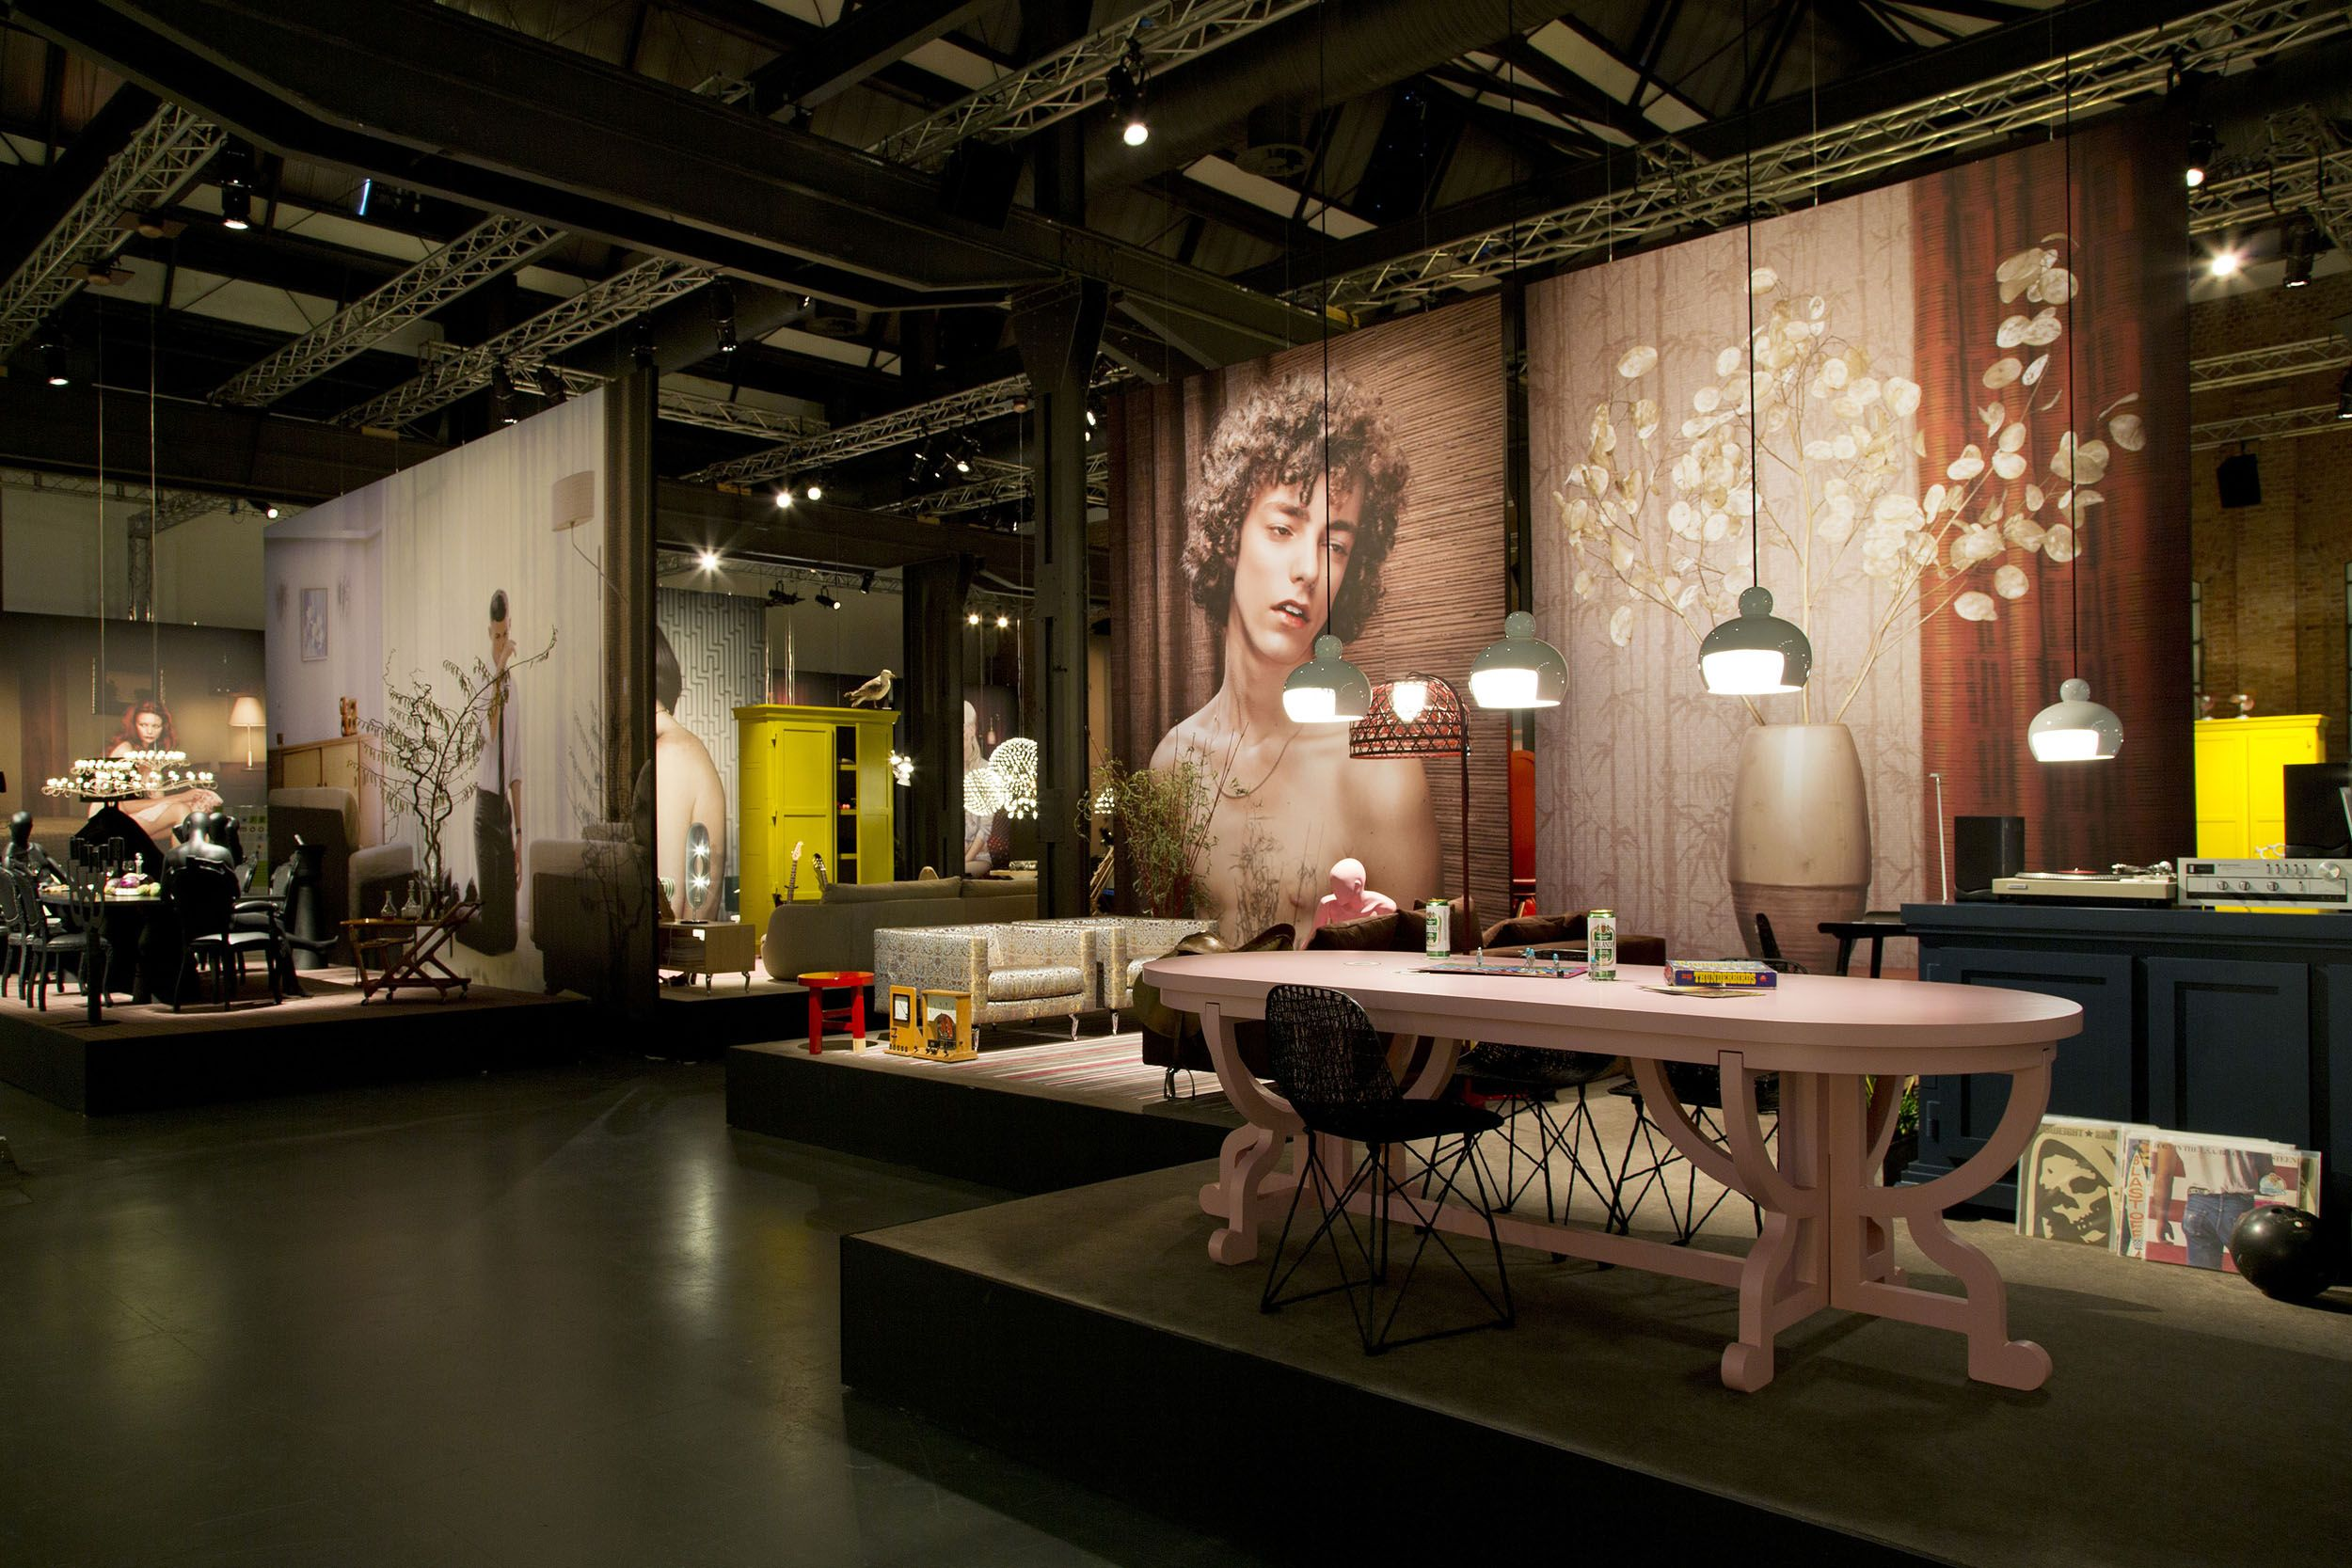 mooi furniture. Moooi Juuyo Suspension Lamp By Lorenza Bozzoli With Koi Fish Or Peach Flowers For Sale At 1stdibs Mooi Furniture